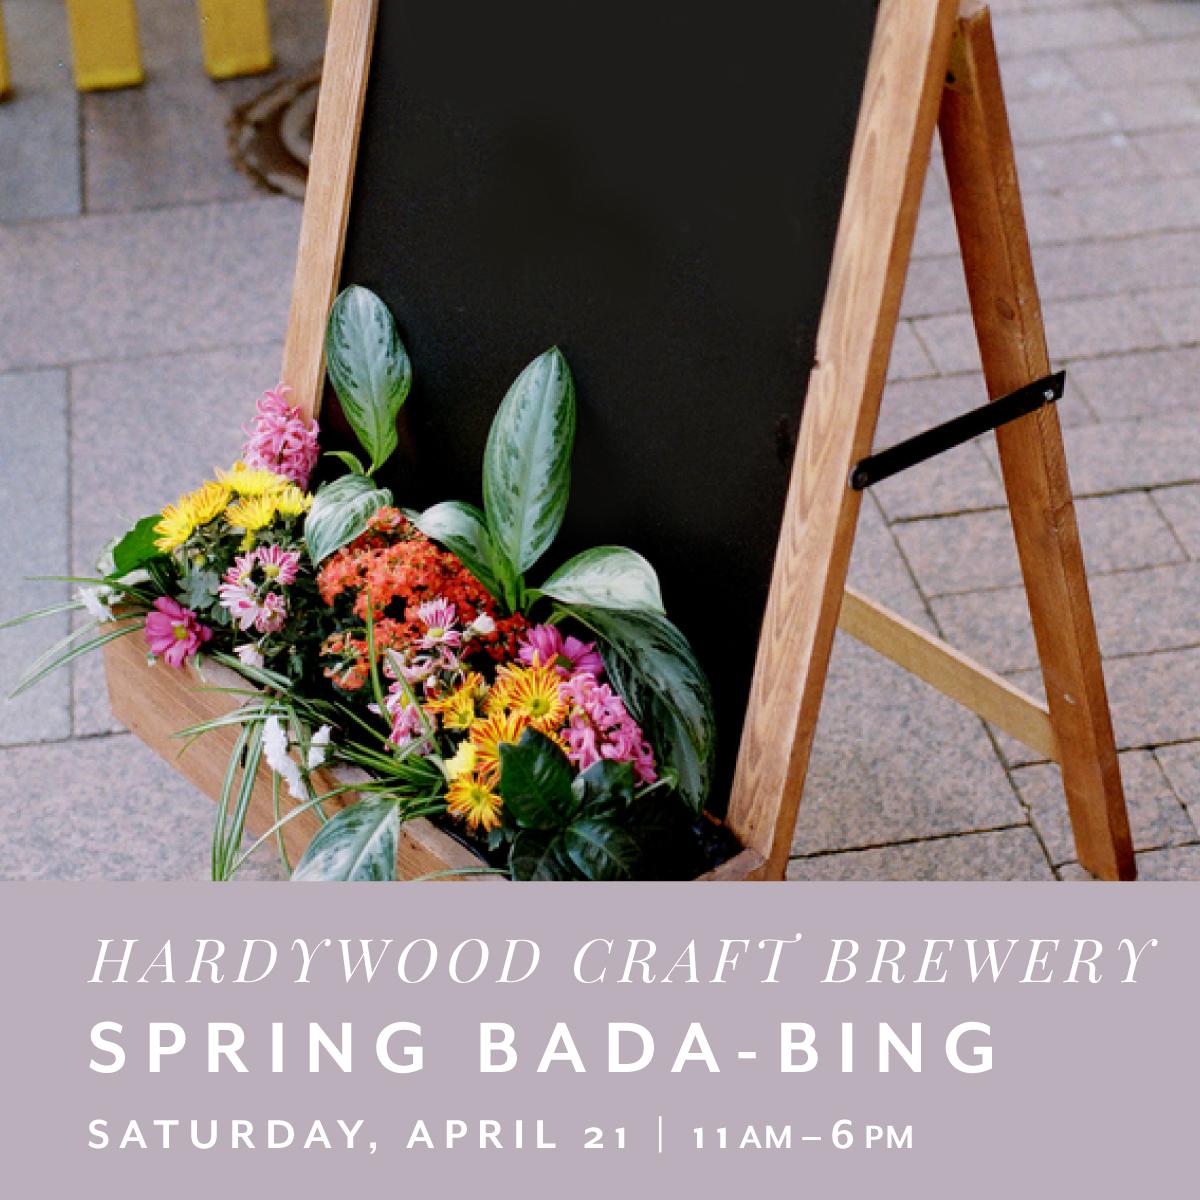 PaperRoseCo at Spring Bada-Bing